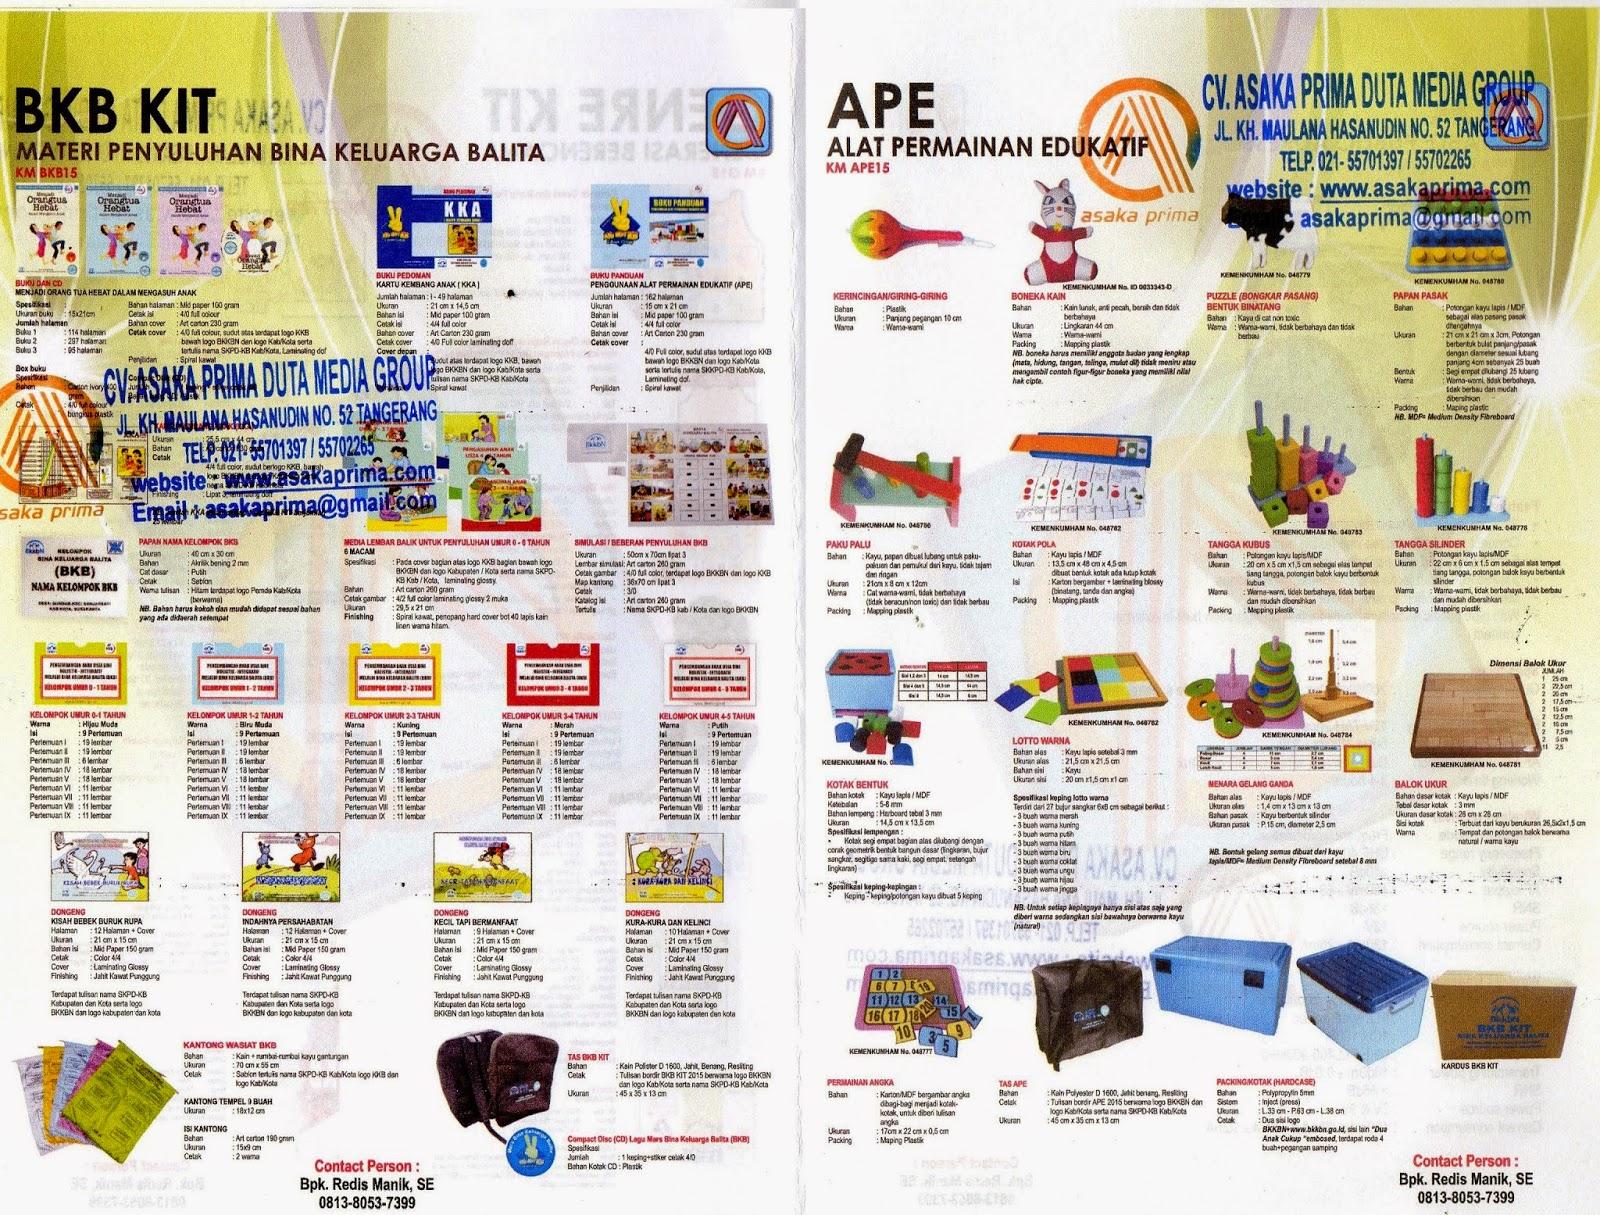 bkb kit  2015, bkbkit 2015,bkb-kit,jual bkb kit,BKB-Kit alat peraga edukatif, bkb kit -ape kit, bkb-ape kit dak bkkbn 2015, bkbkit ape kit dakbkkbn, bkb ape-kit bkkbn2015, bkb kit ape bkkbn, bkb-kit ape kit dakbkkbn 2015, bkb permainan edukatif , Buku bkb kit,tas bkb kit,materi penyuluhan bkb kit,sarana media penyuluhan kb,buku bkb kit,buku bkb kit 2015